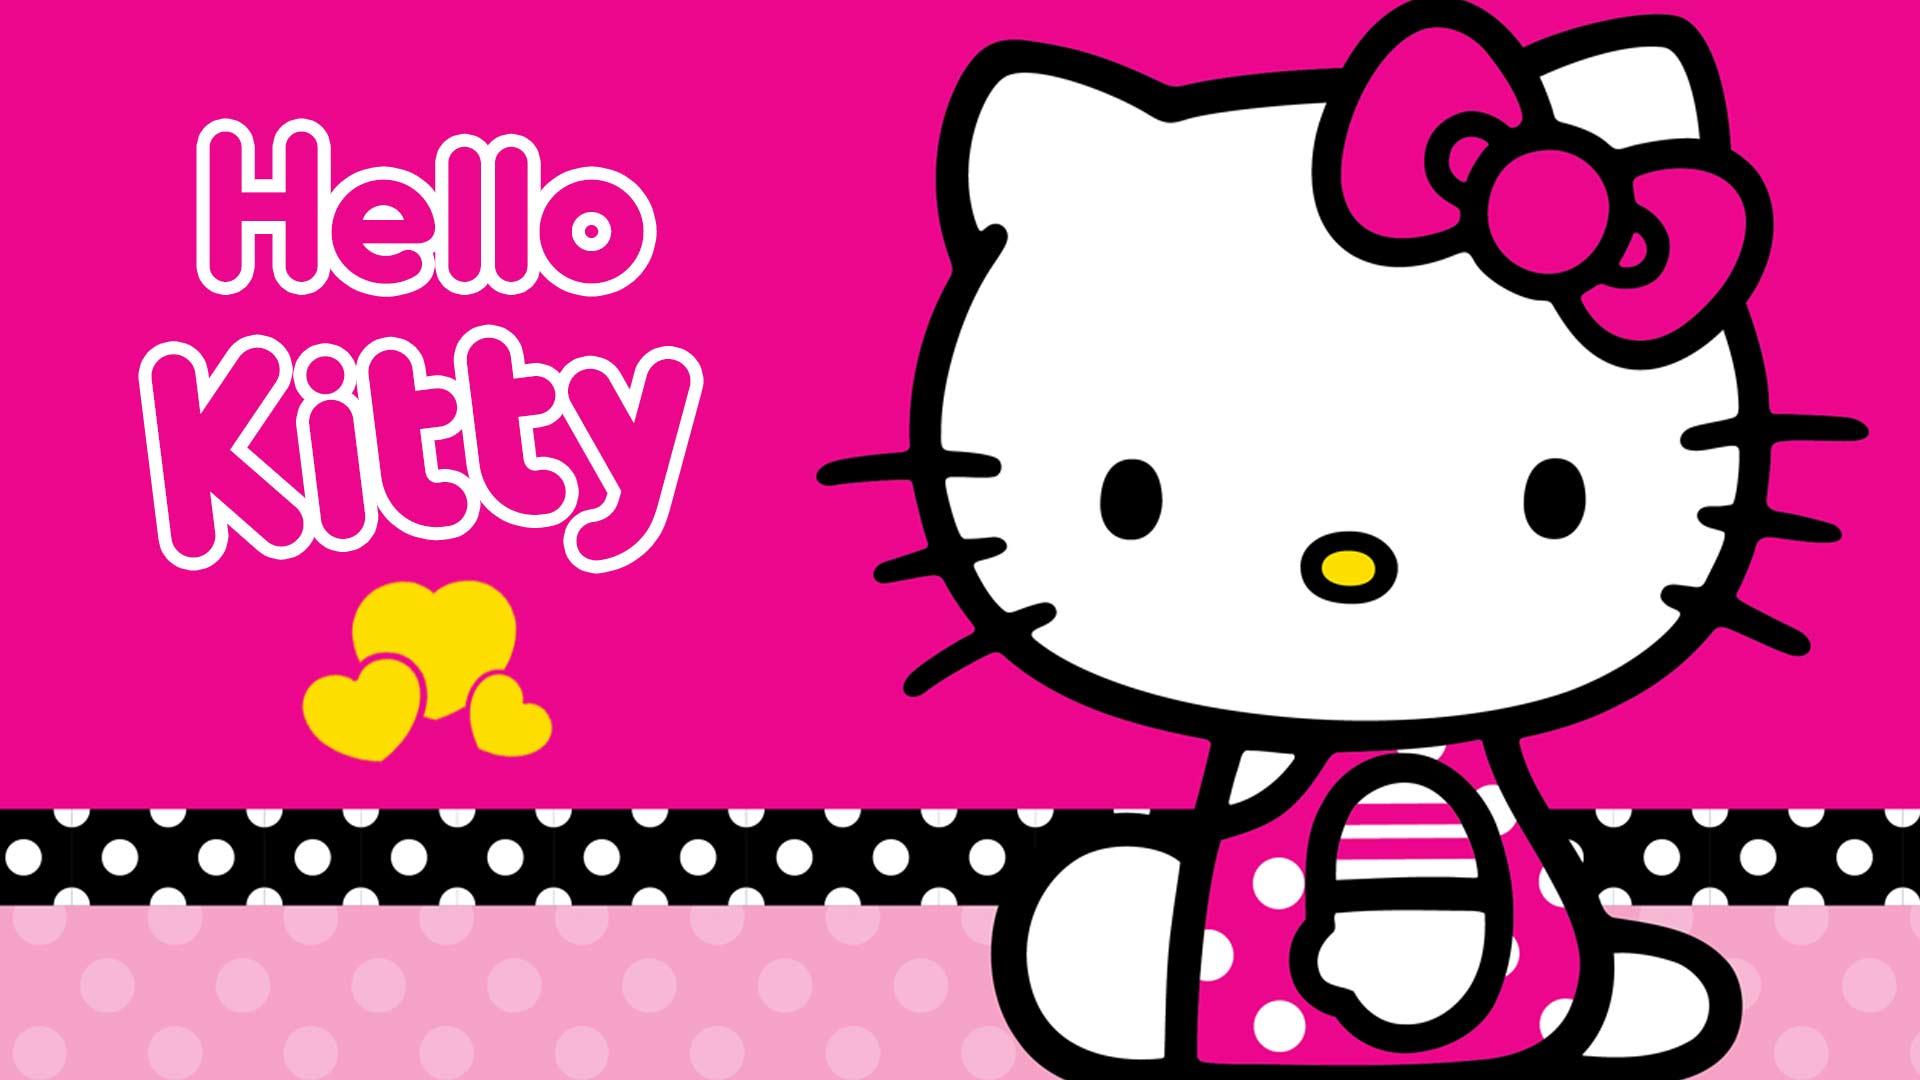 Hello Kitty banner image